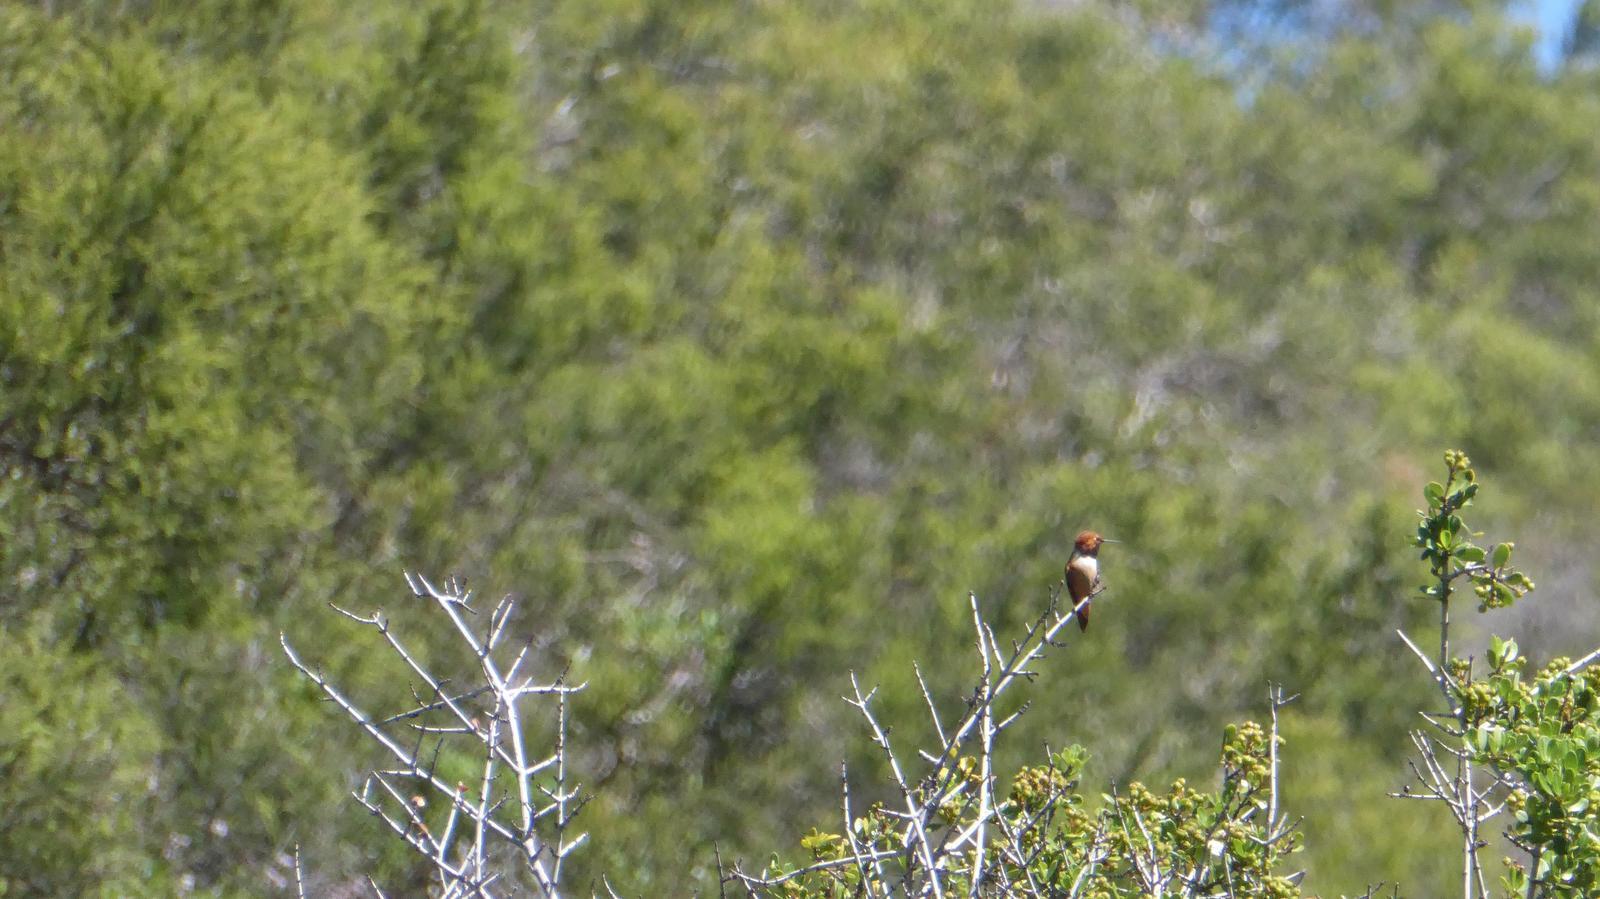 Rufous Hummingbird Photo by Daliel Leite